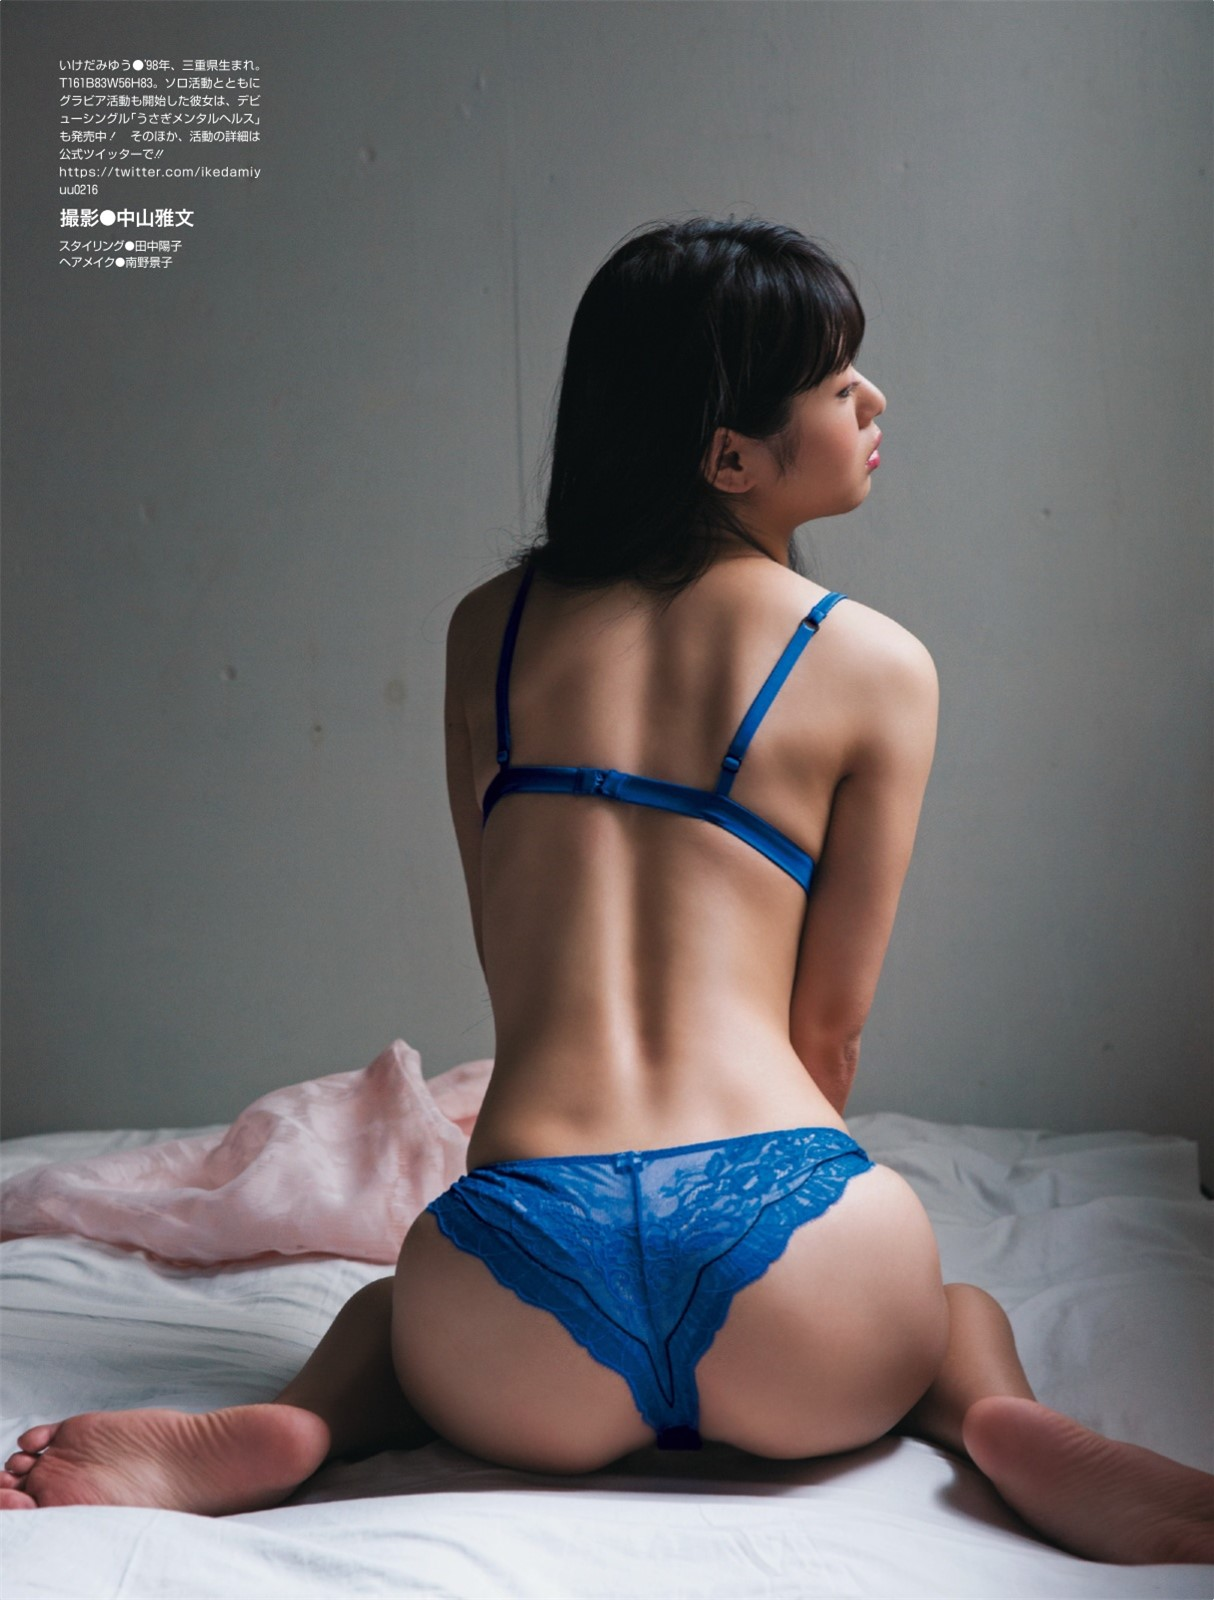 Miyu Ikeda 池田美夕, Shukan SPA! 2017.08.08 (週刊スパ 2017年08月08日号)